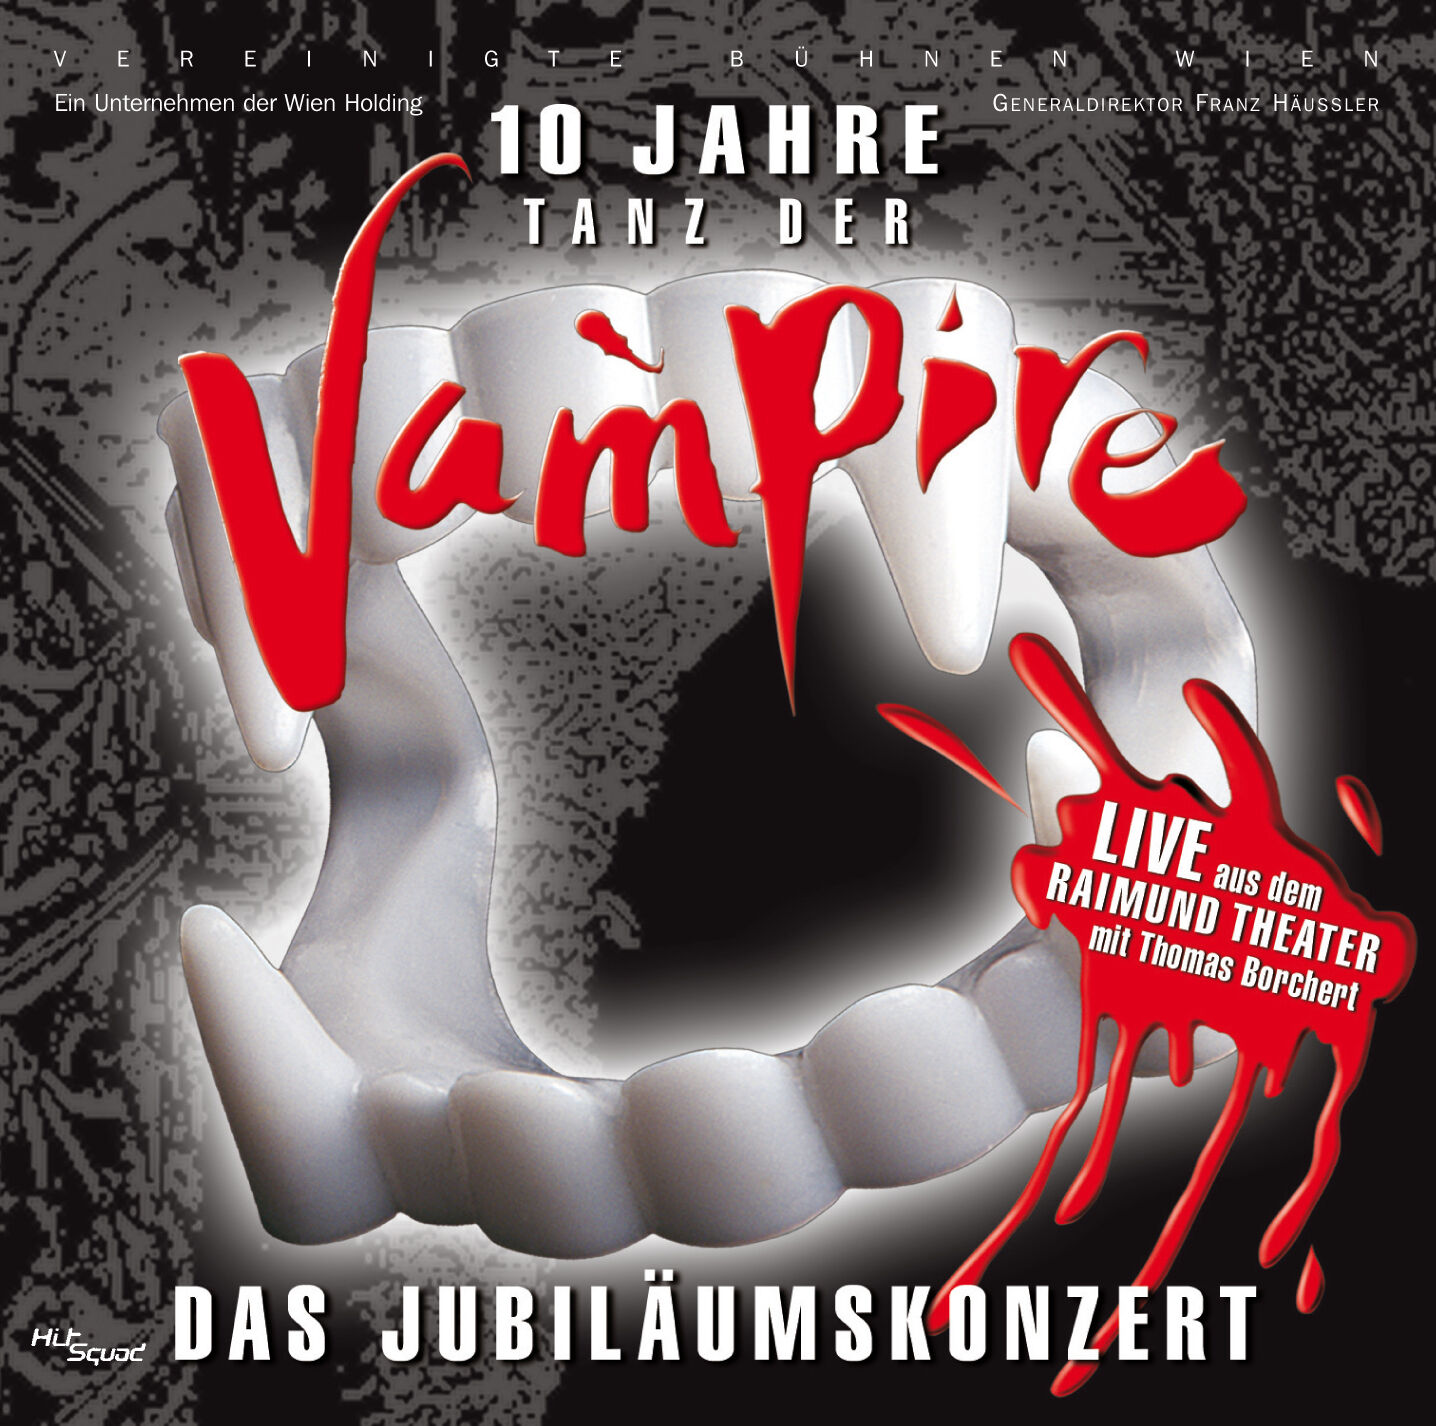 Tanz der Vampire - Das Musical - 10 Jahre - Jubiläumskonzert CD NEU + OVP!